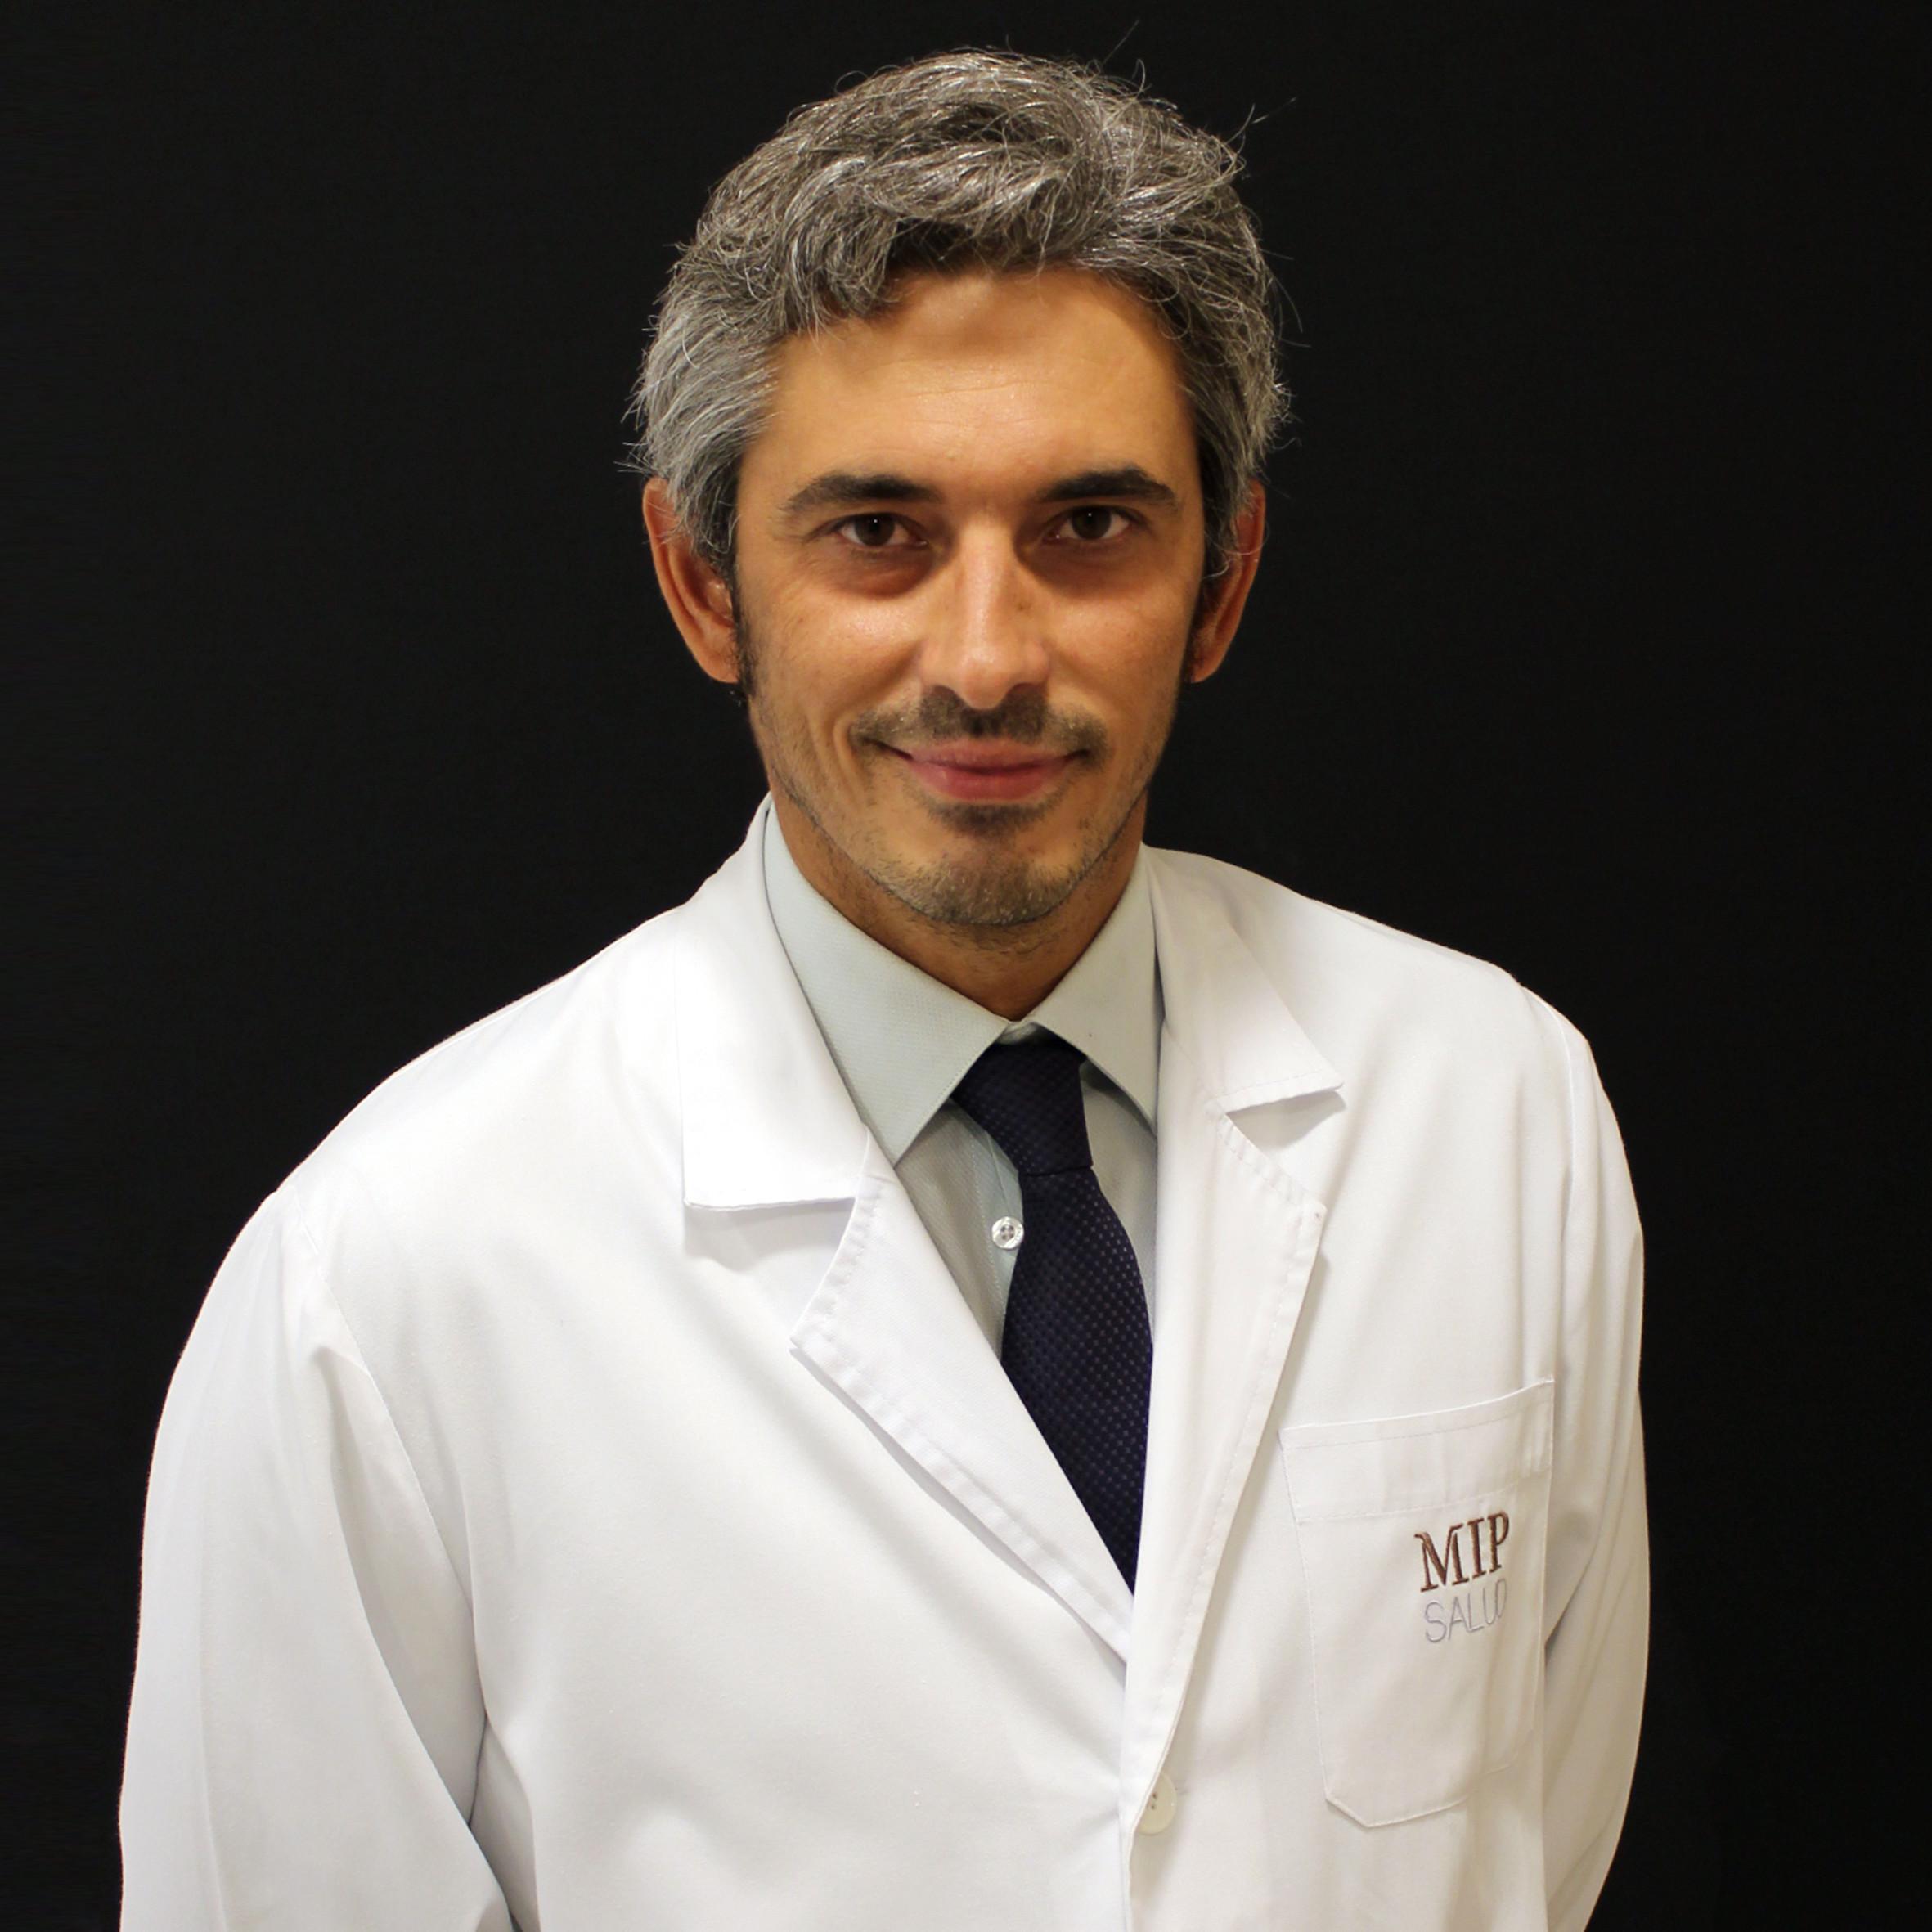 Dr. Fernando Corella Montoya